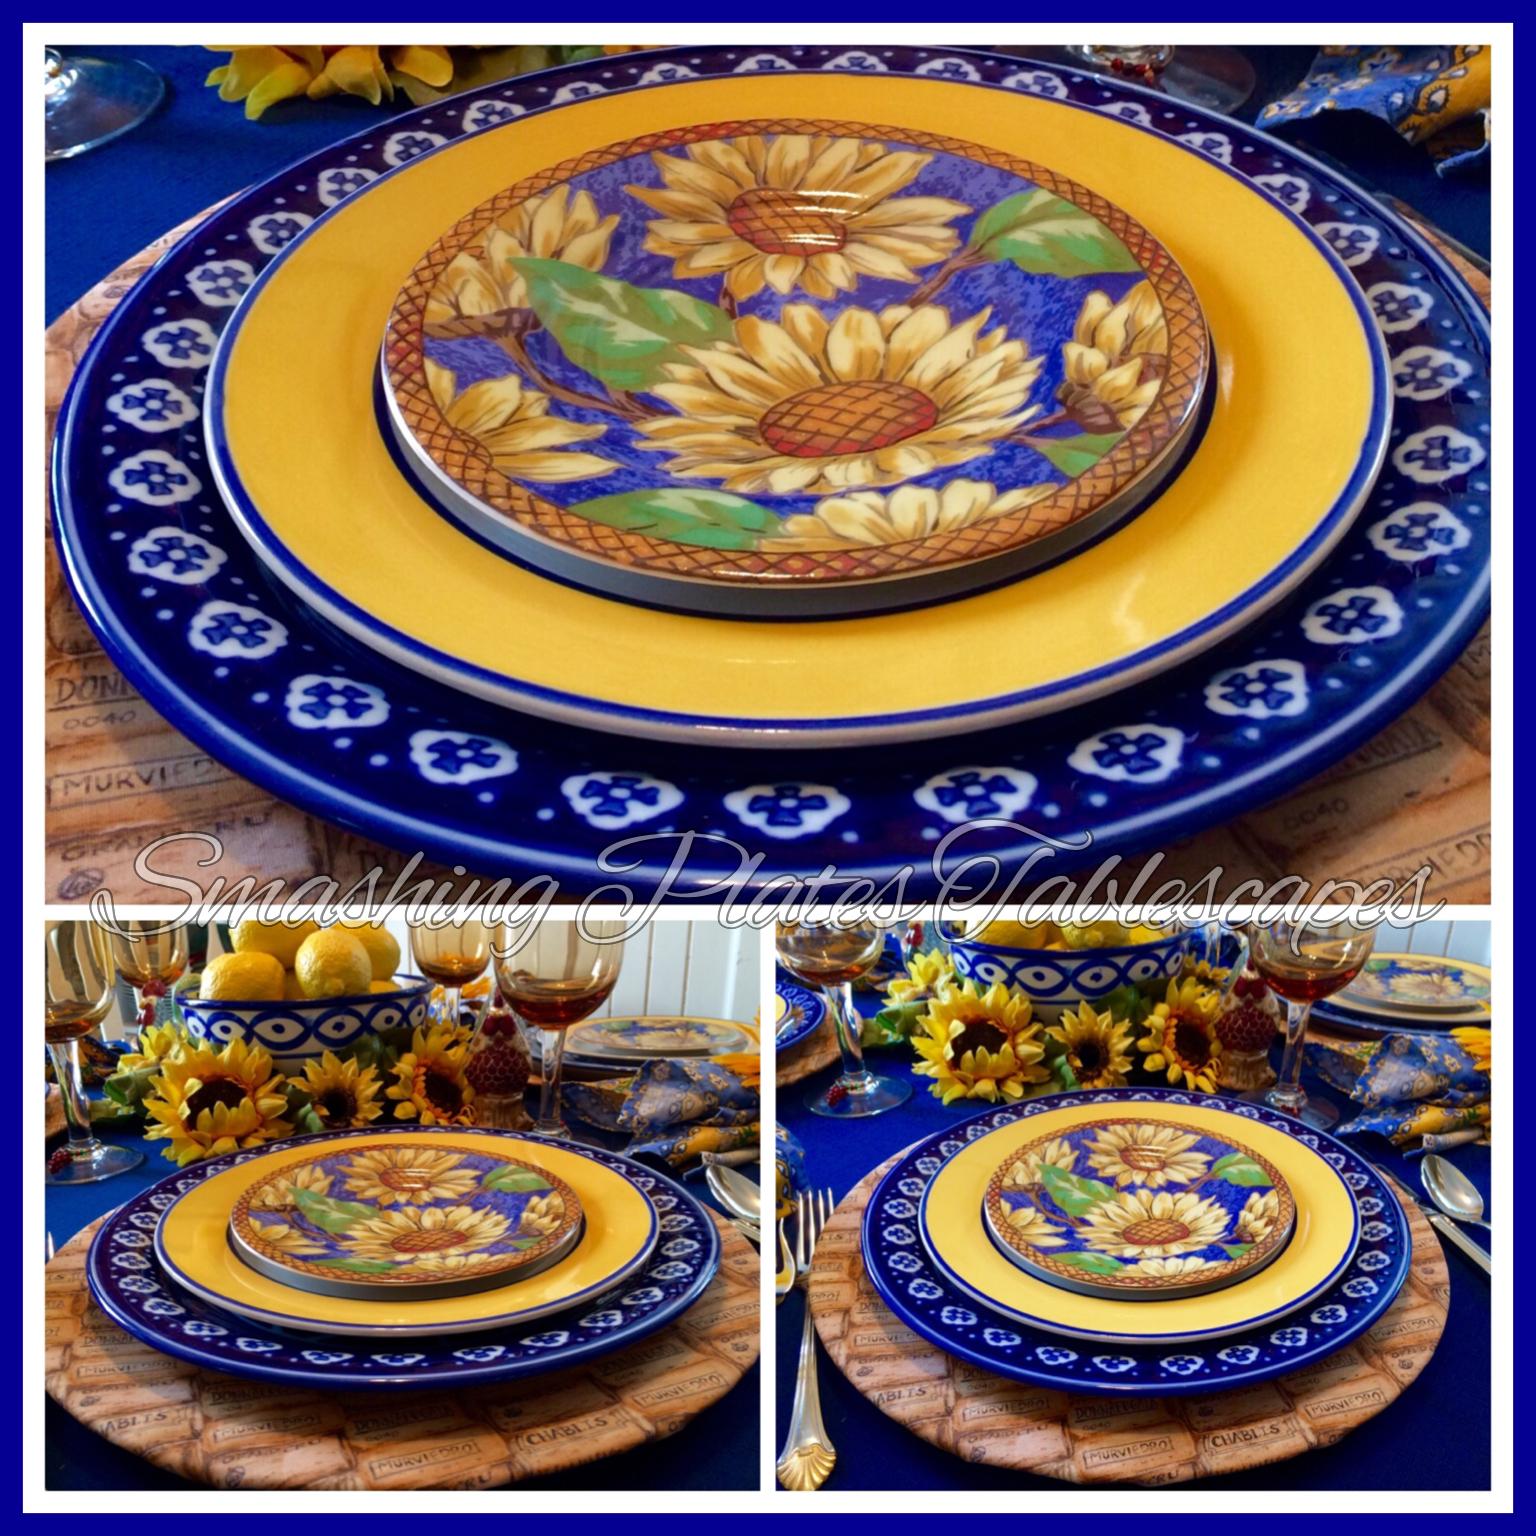 Sunflower place setting.  sc 1 st  Smashing Plates Tablescapes - Blogger & Smashing Plates Tablescapes: September Sunflowers